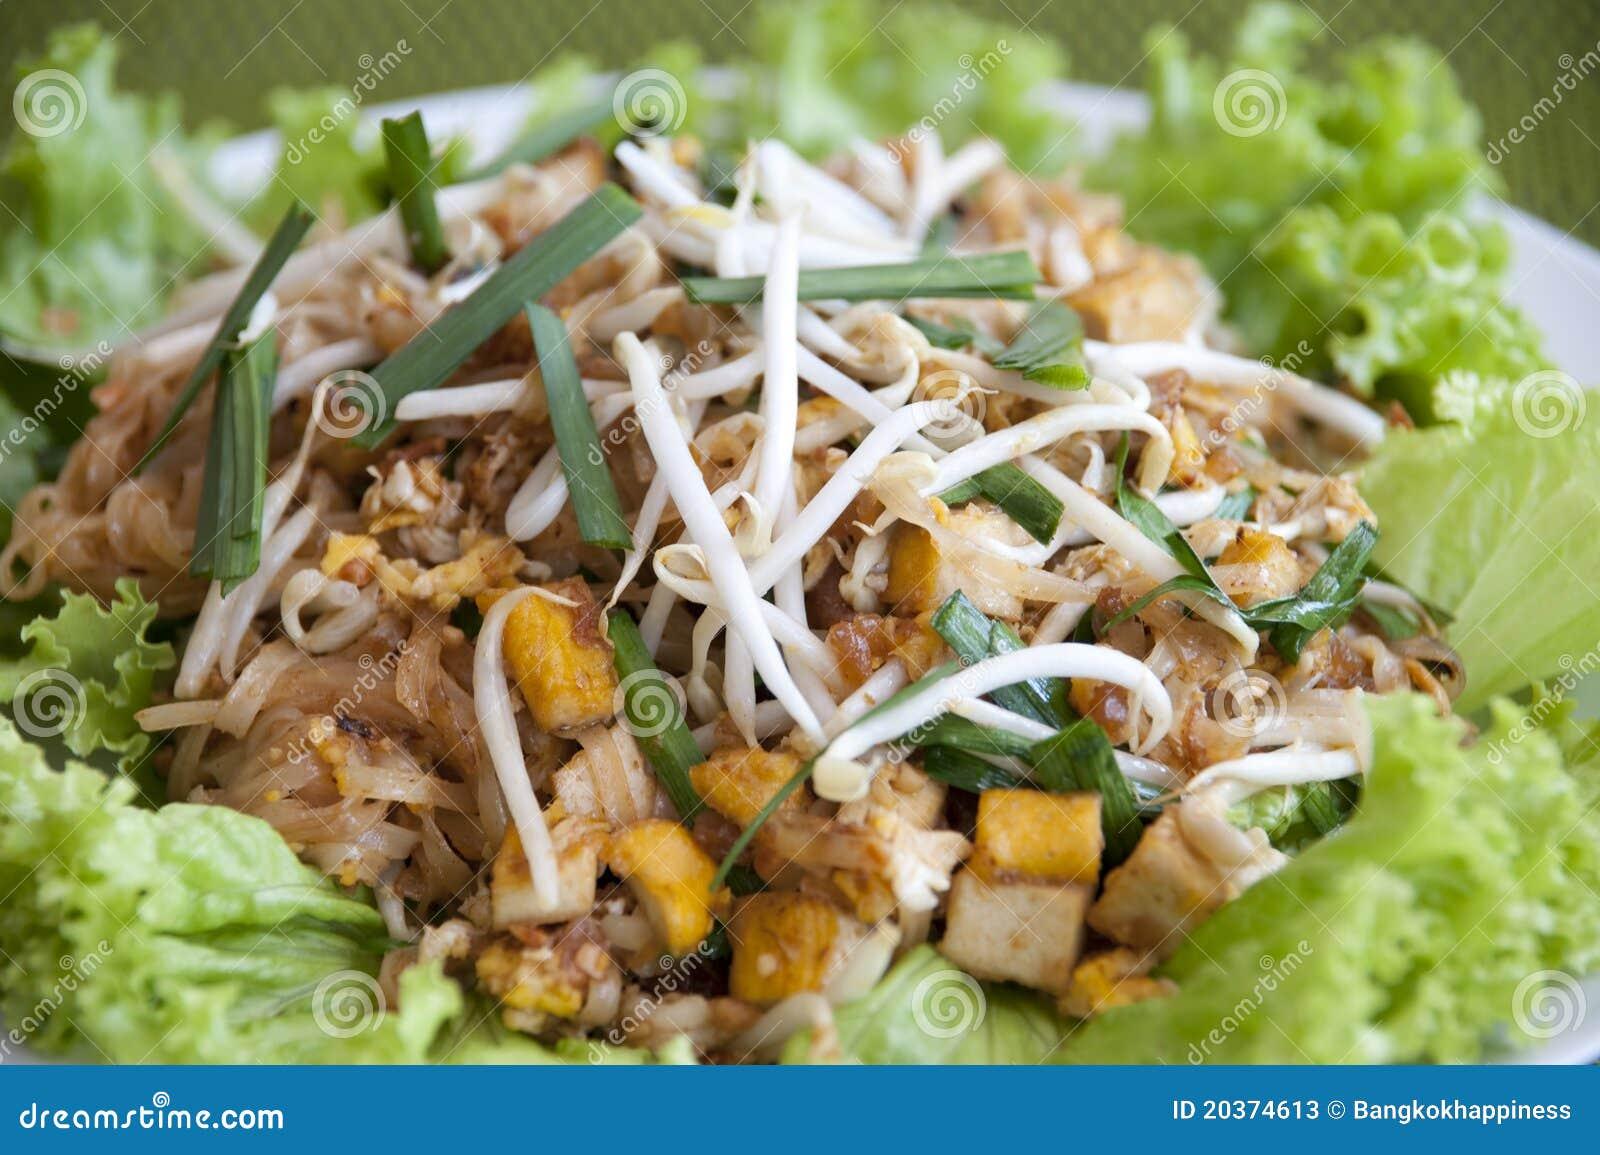 Pad thai, Stir fry noodles Thai food.